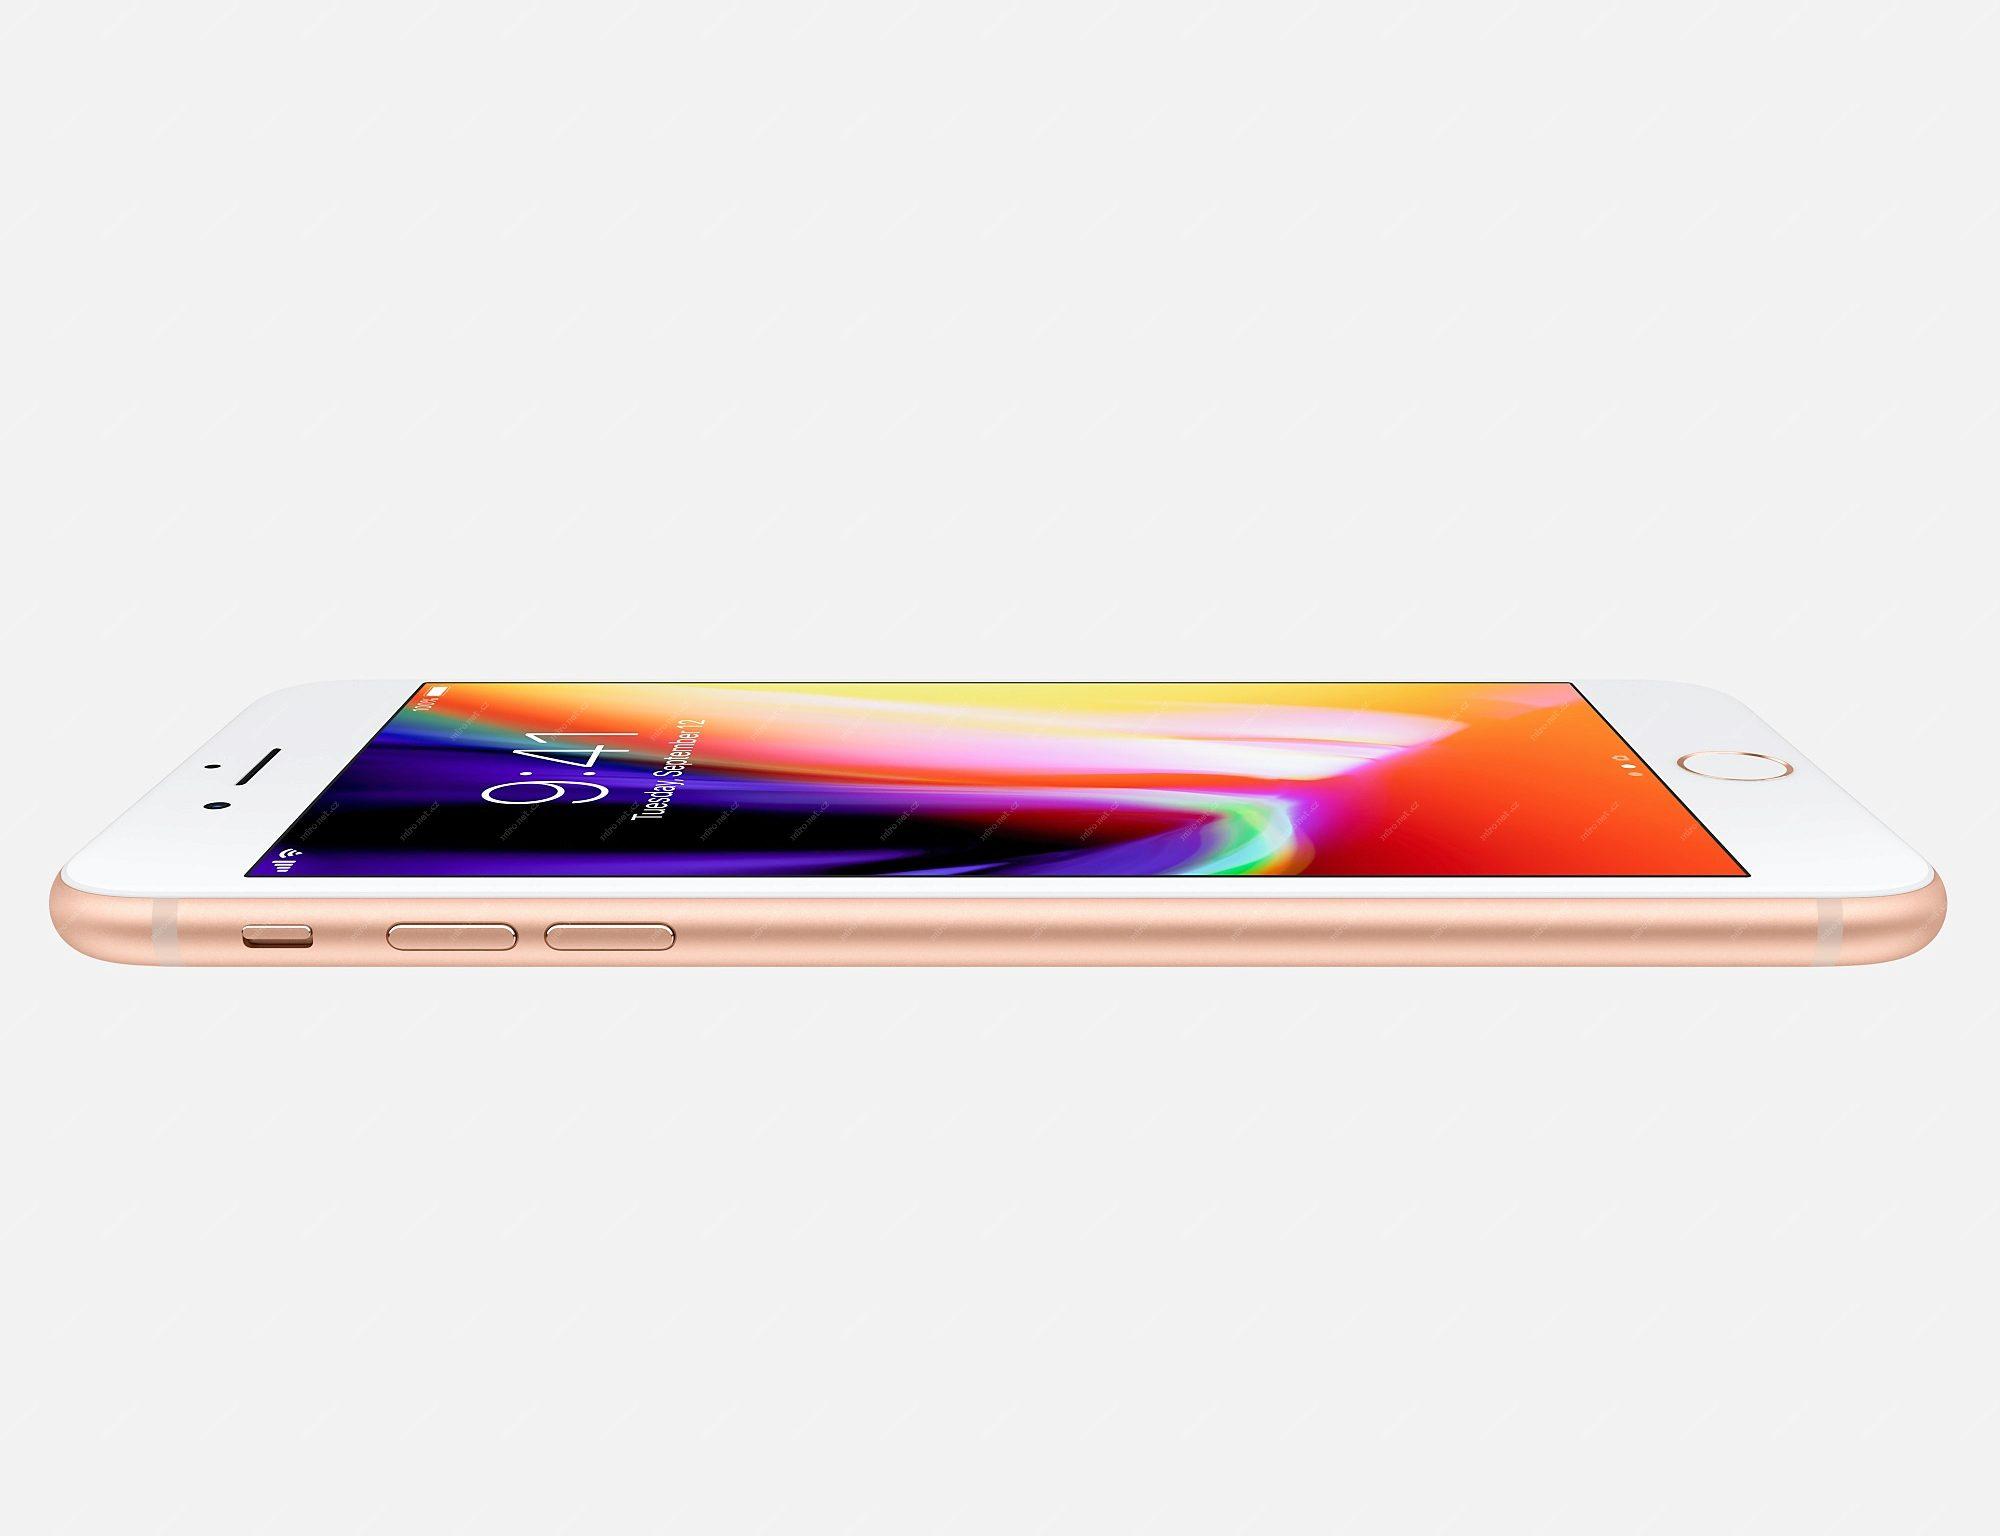 Mobilní telefon - Apple iPhone 8 Plus - 64GB stříbrná   iOS12 ... 707b0e016e3